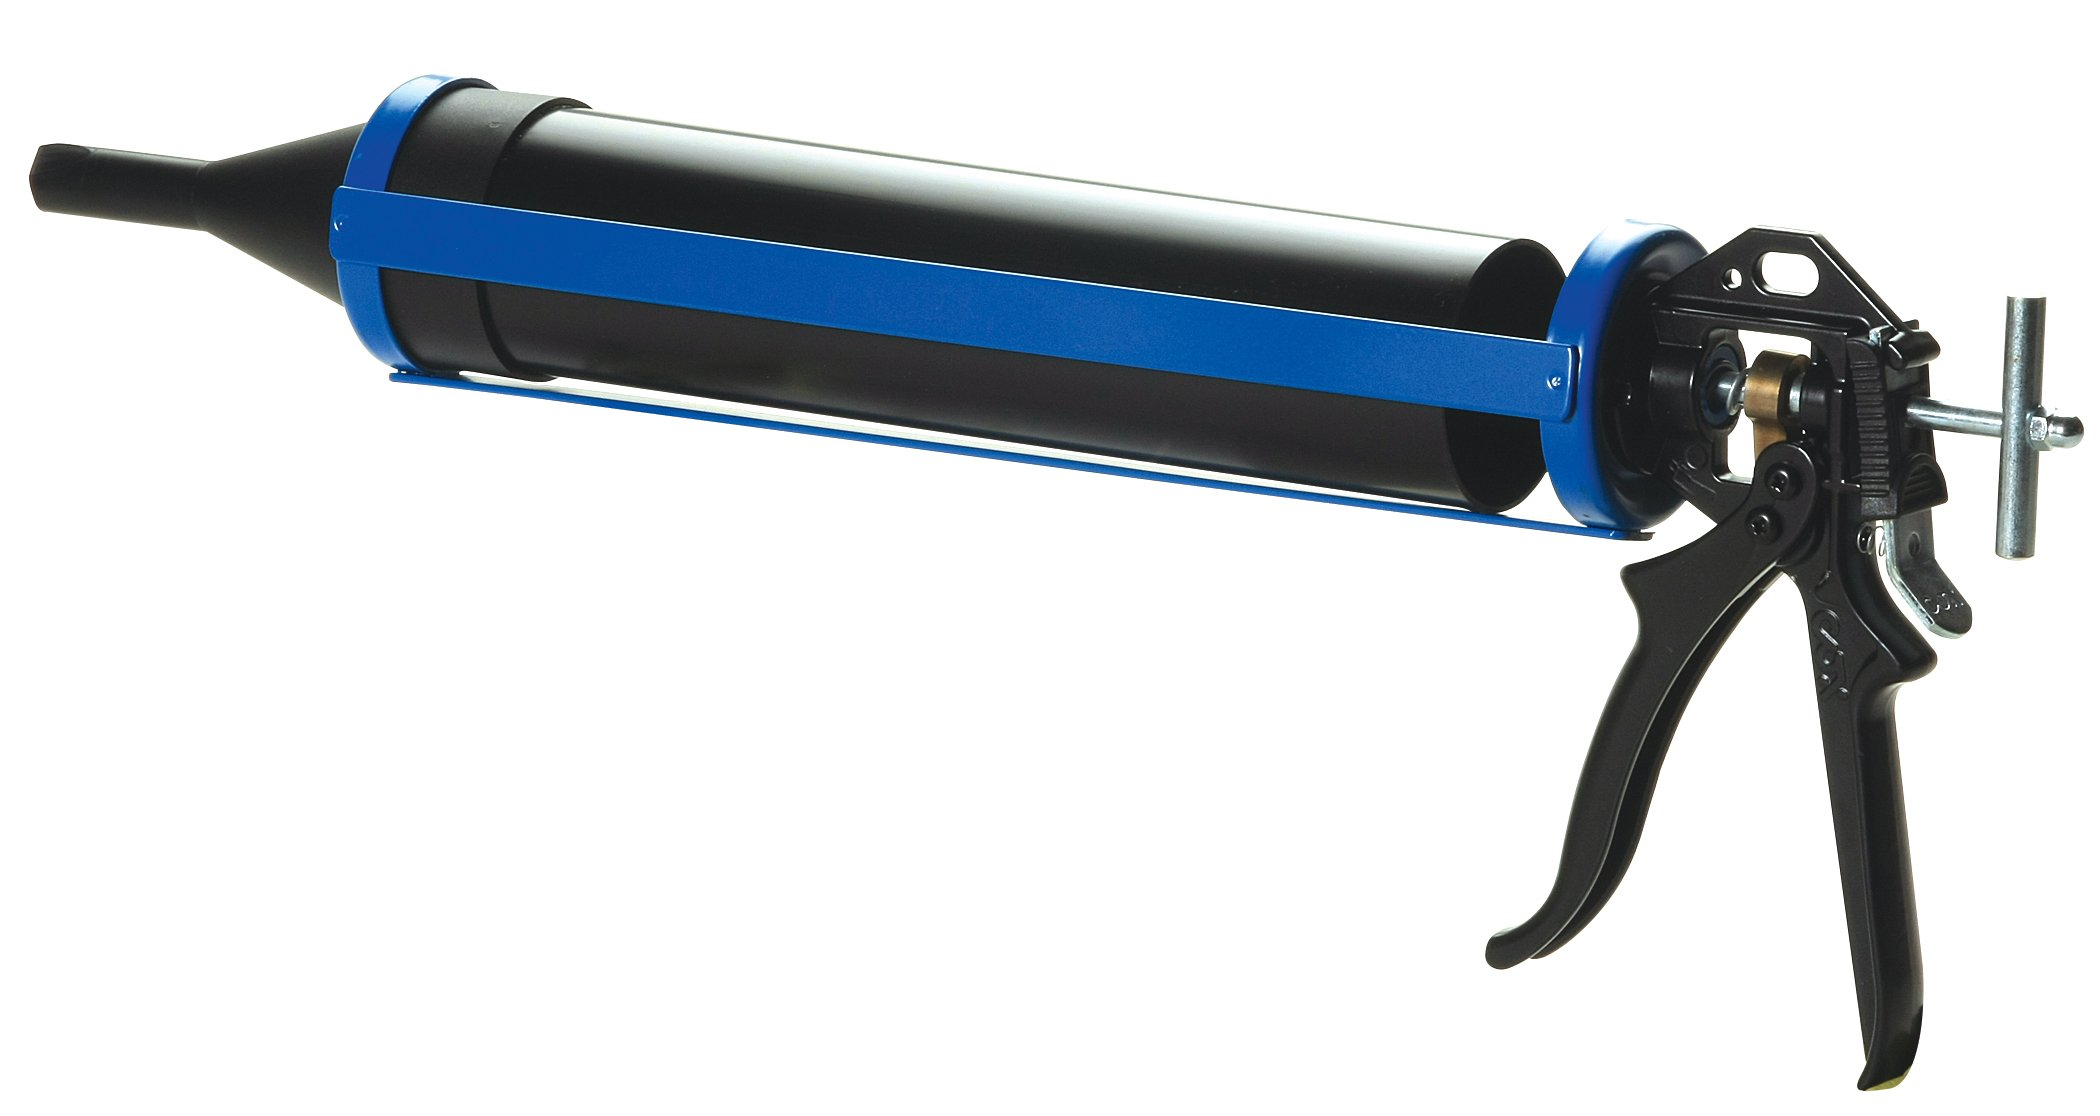 COX 41006 Tuck Point 1-Quart Capacity Tube Rotating Cradle Manual Caulk Gun by COX